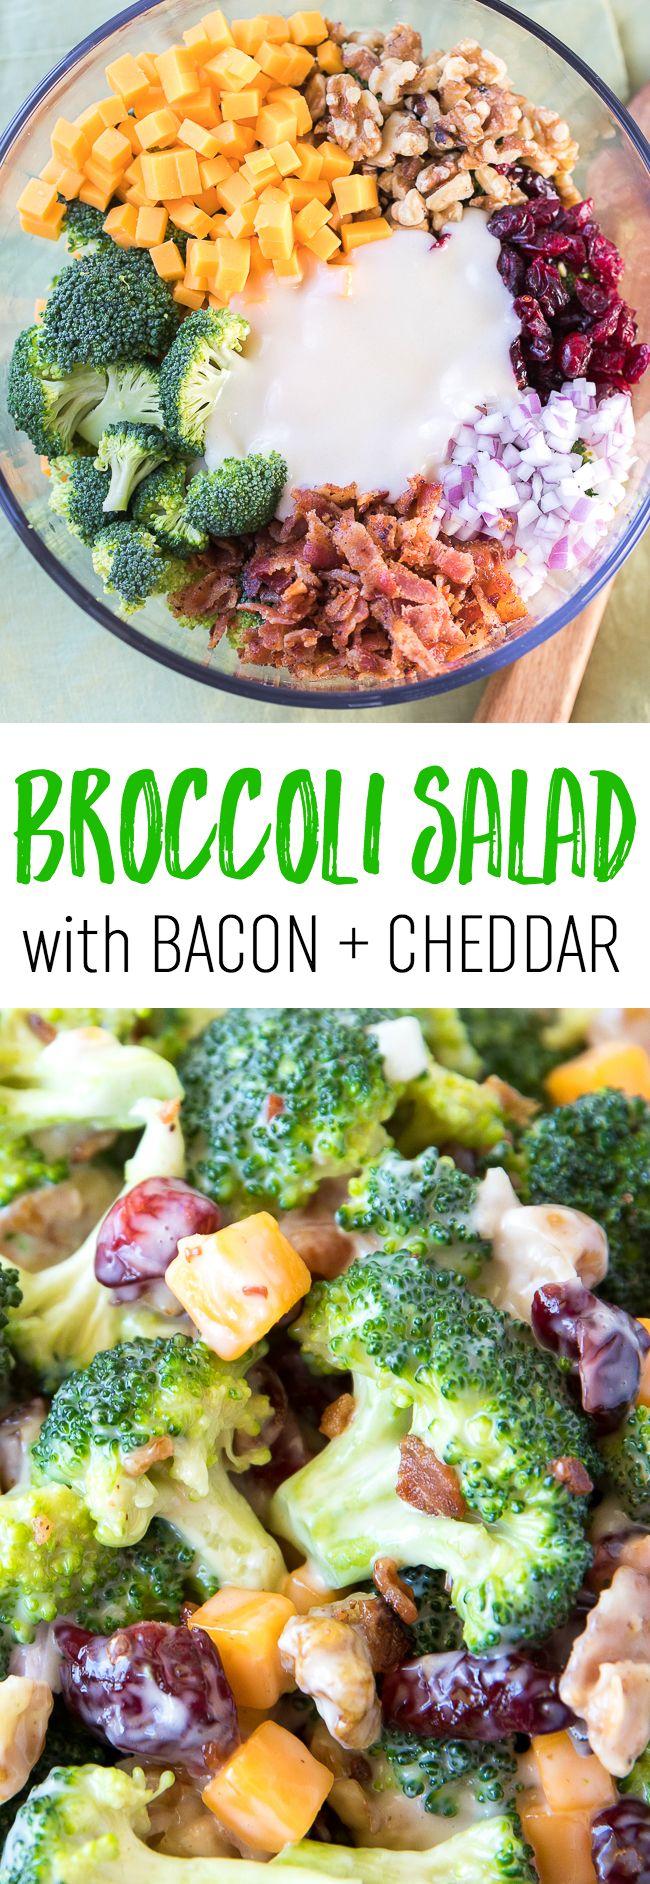 Broccoli Salad with Bacon and Cheddar Recipe | Best Broccoli Salad | Broccoli Salad with Dried Cranberries | Broccoli Salad with Walnuts